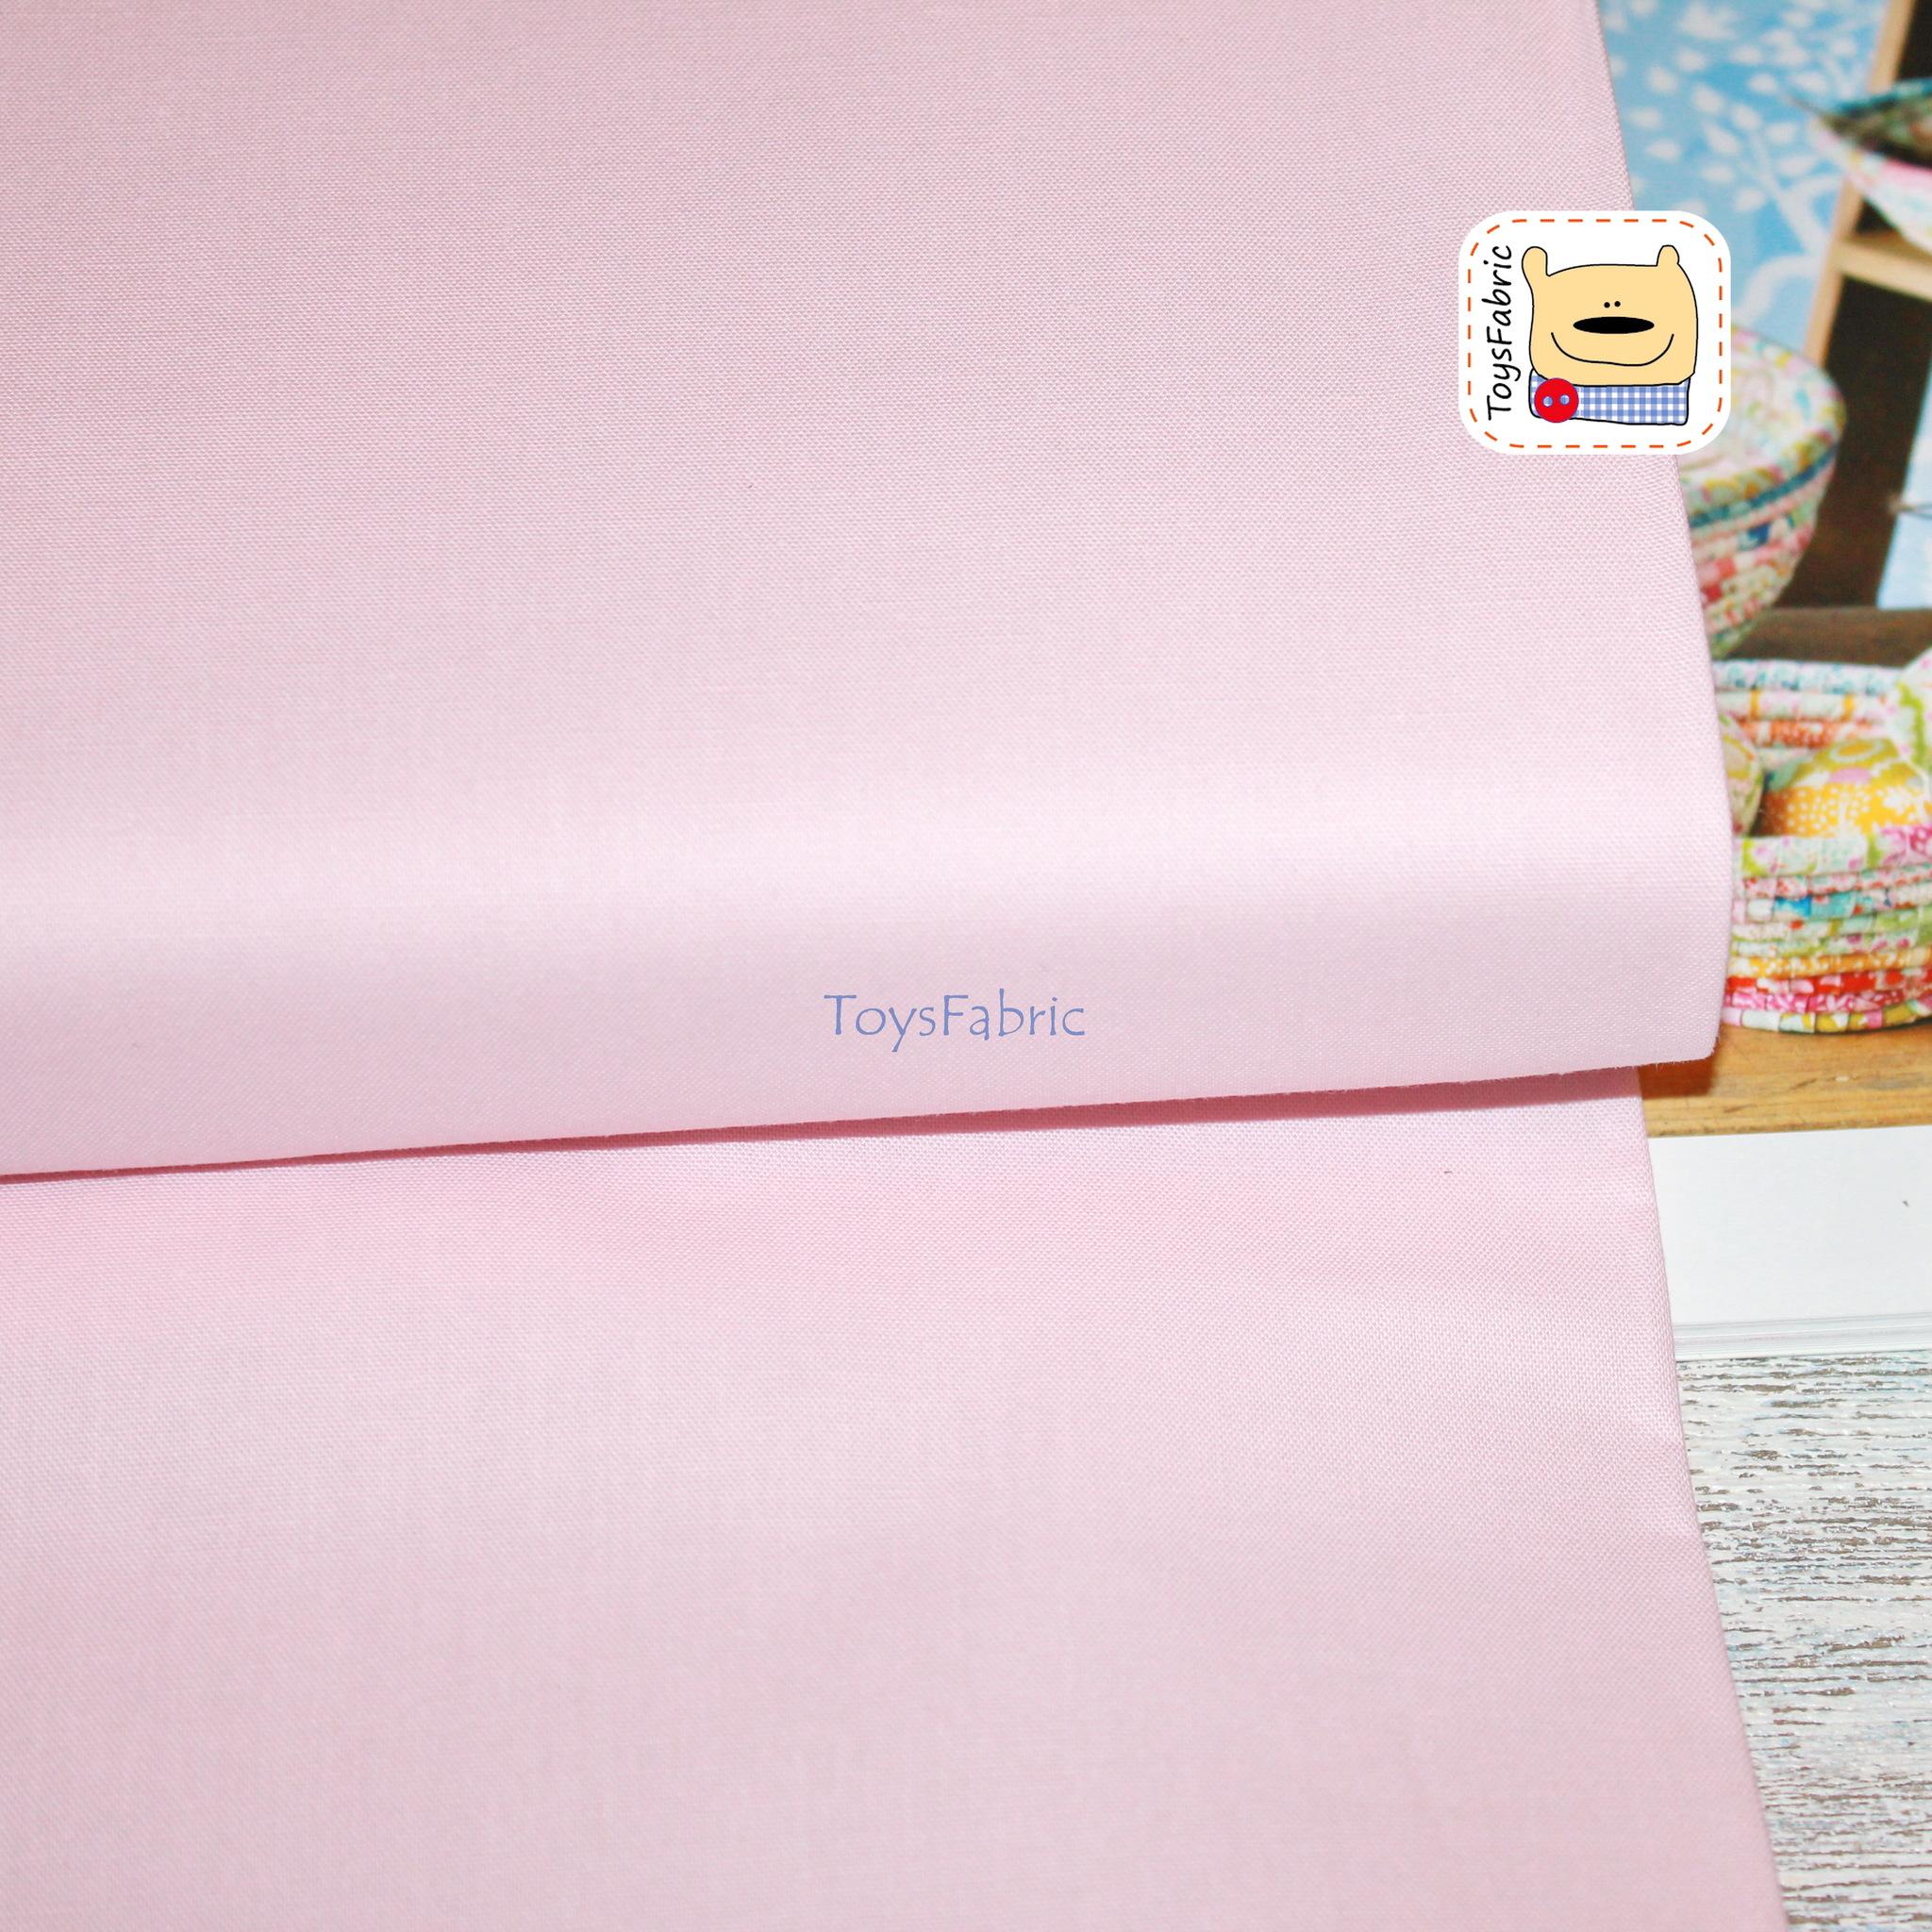 Ткань для пэчворка 20820 корейский хлопок (однотонный бледно-розовый) 45х55см